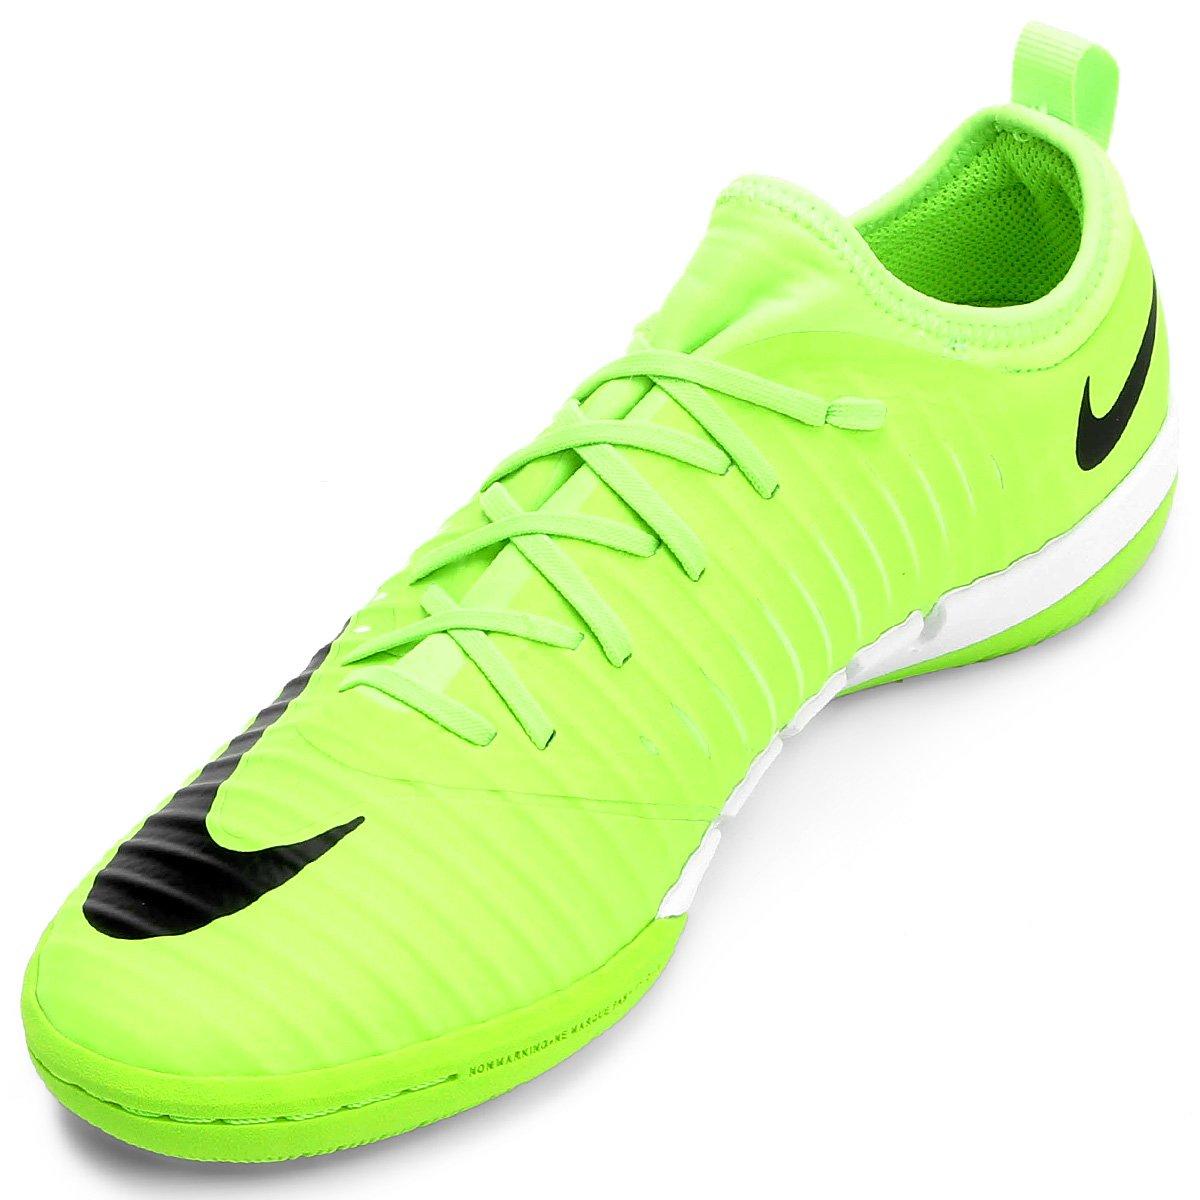 gramática sitio protesta  Chuteira Futsal Nike Mercurial Finale 2 IC | Shop Timão